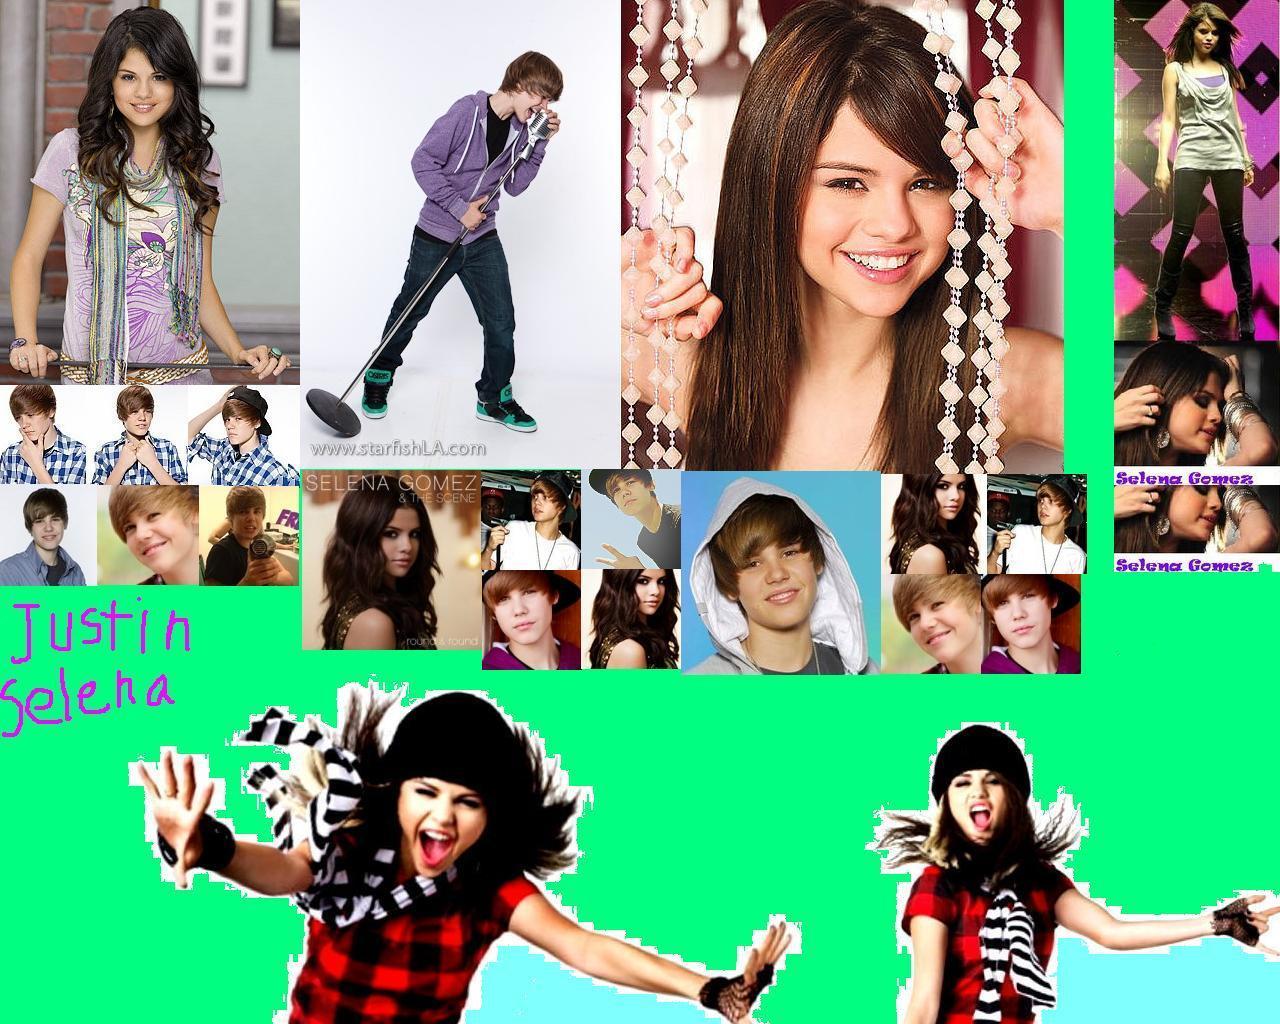 Justin Bieber Wallpapers Thumbgal